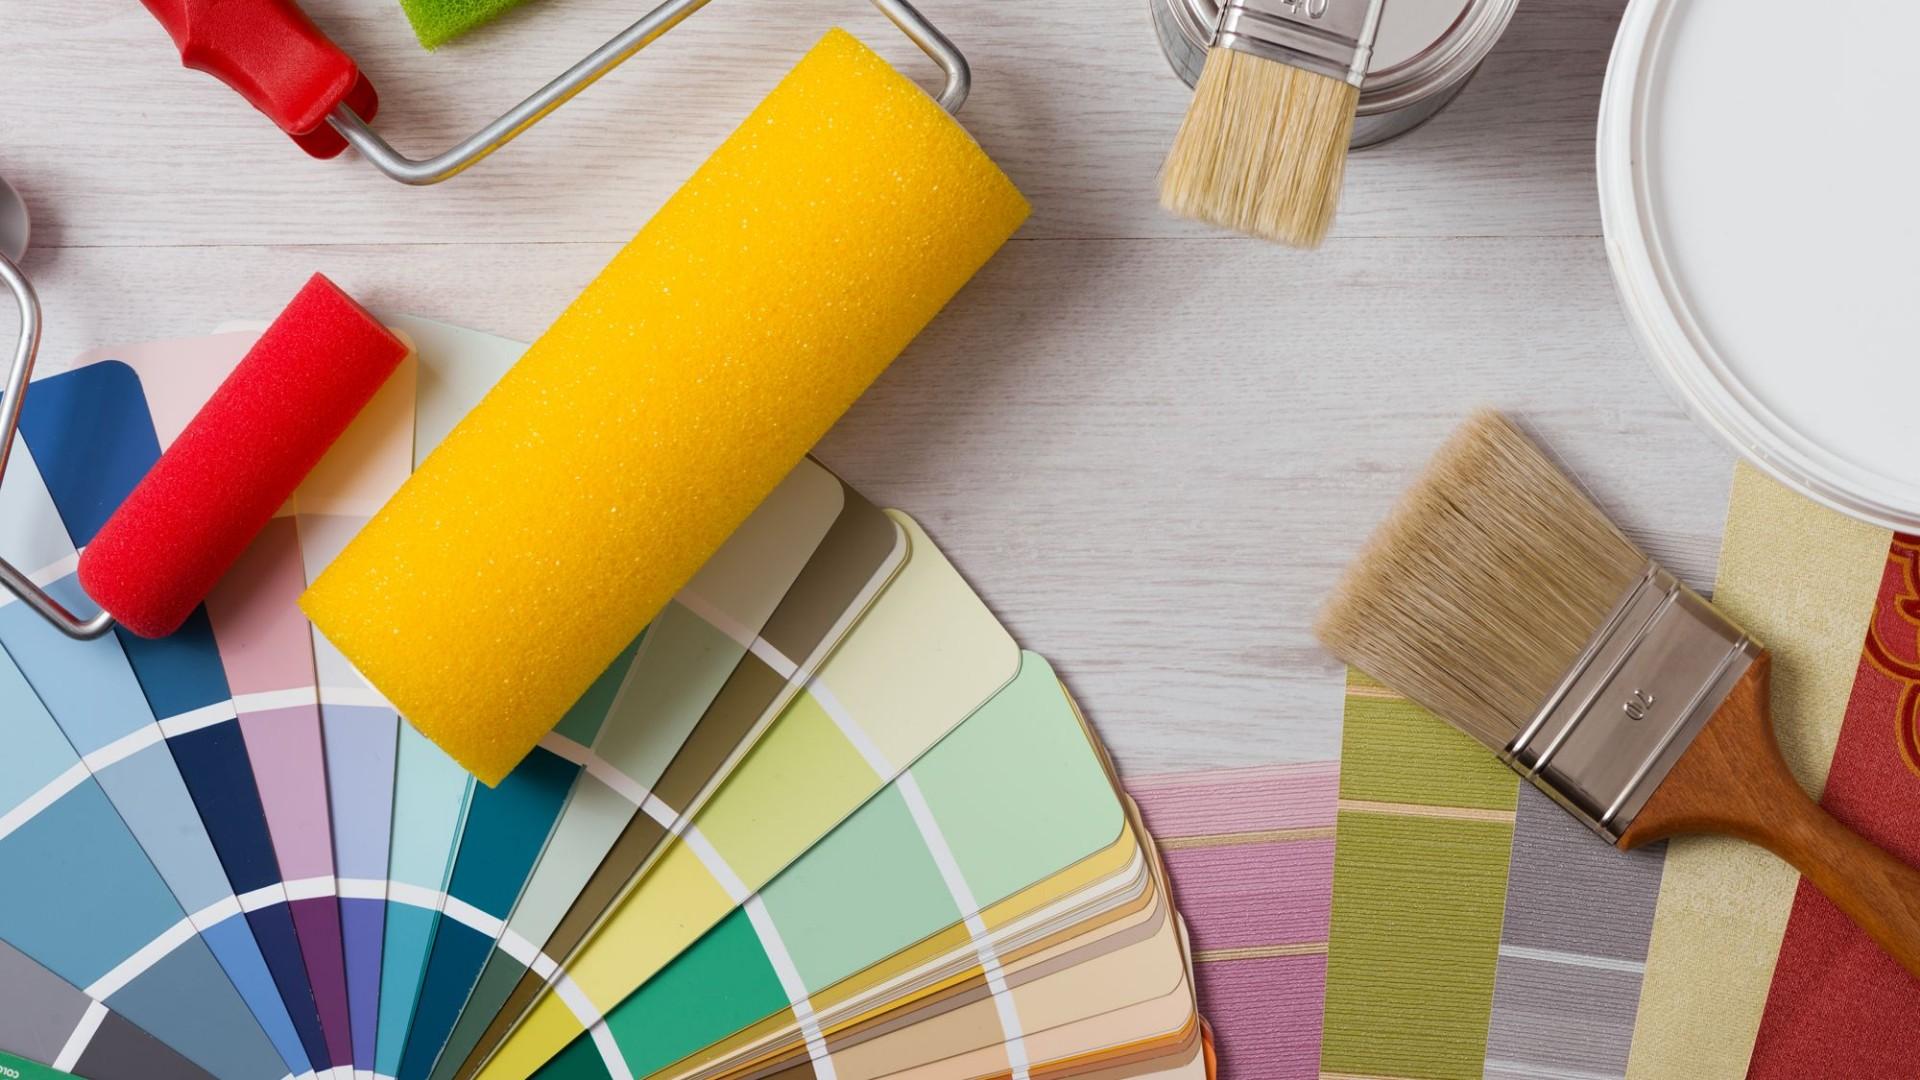 000 pintor pintura color